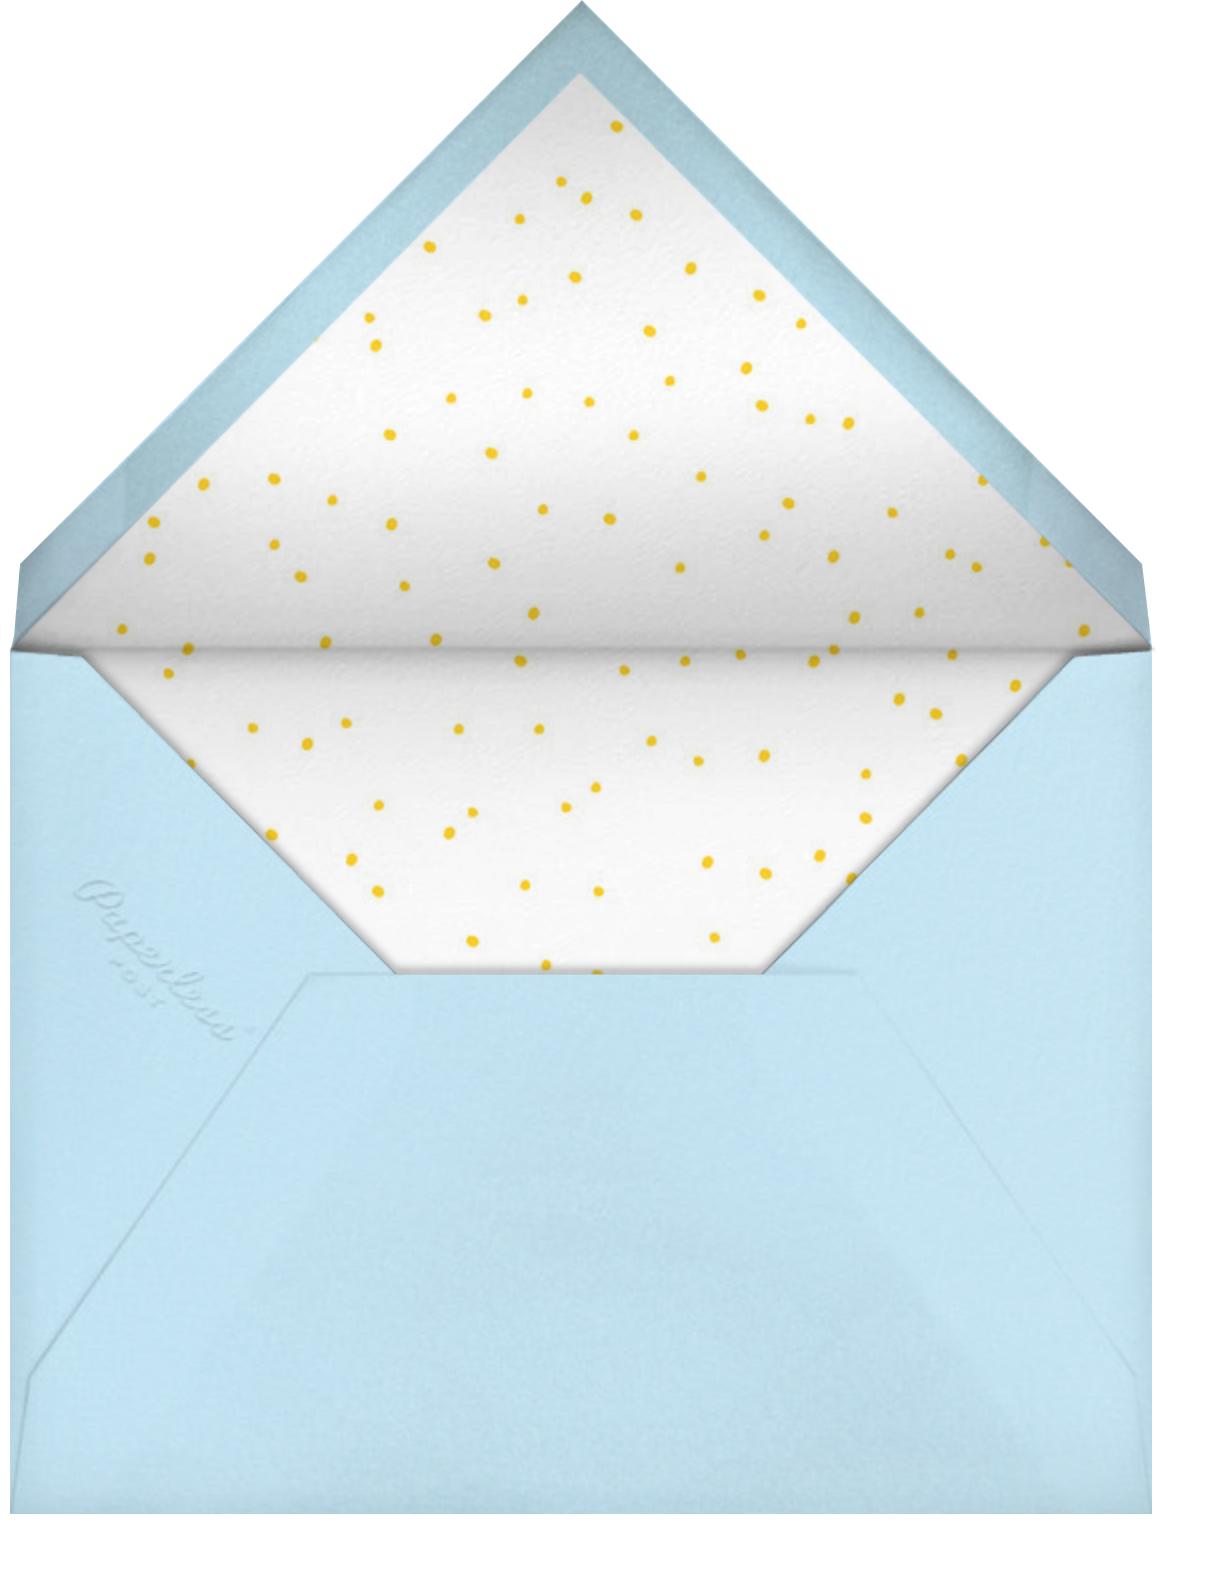 Smiling Skies - Little Cube - Envelope